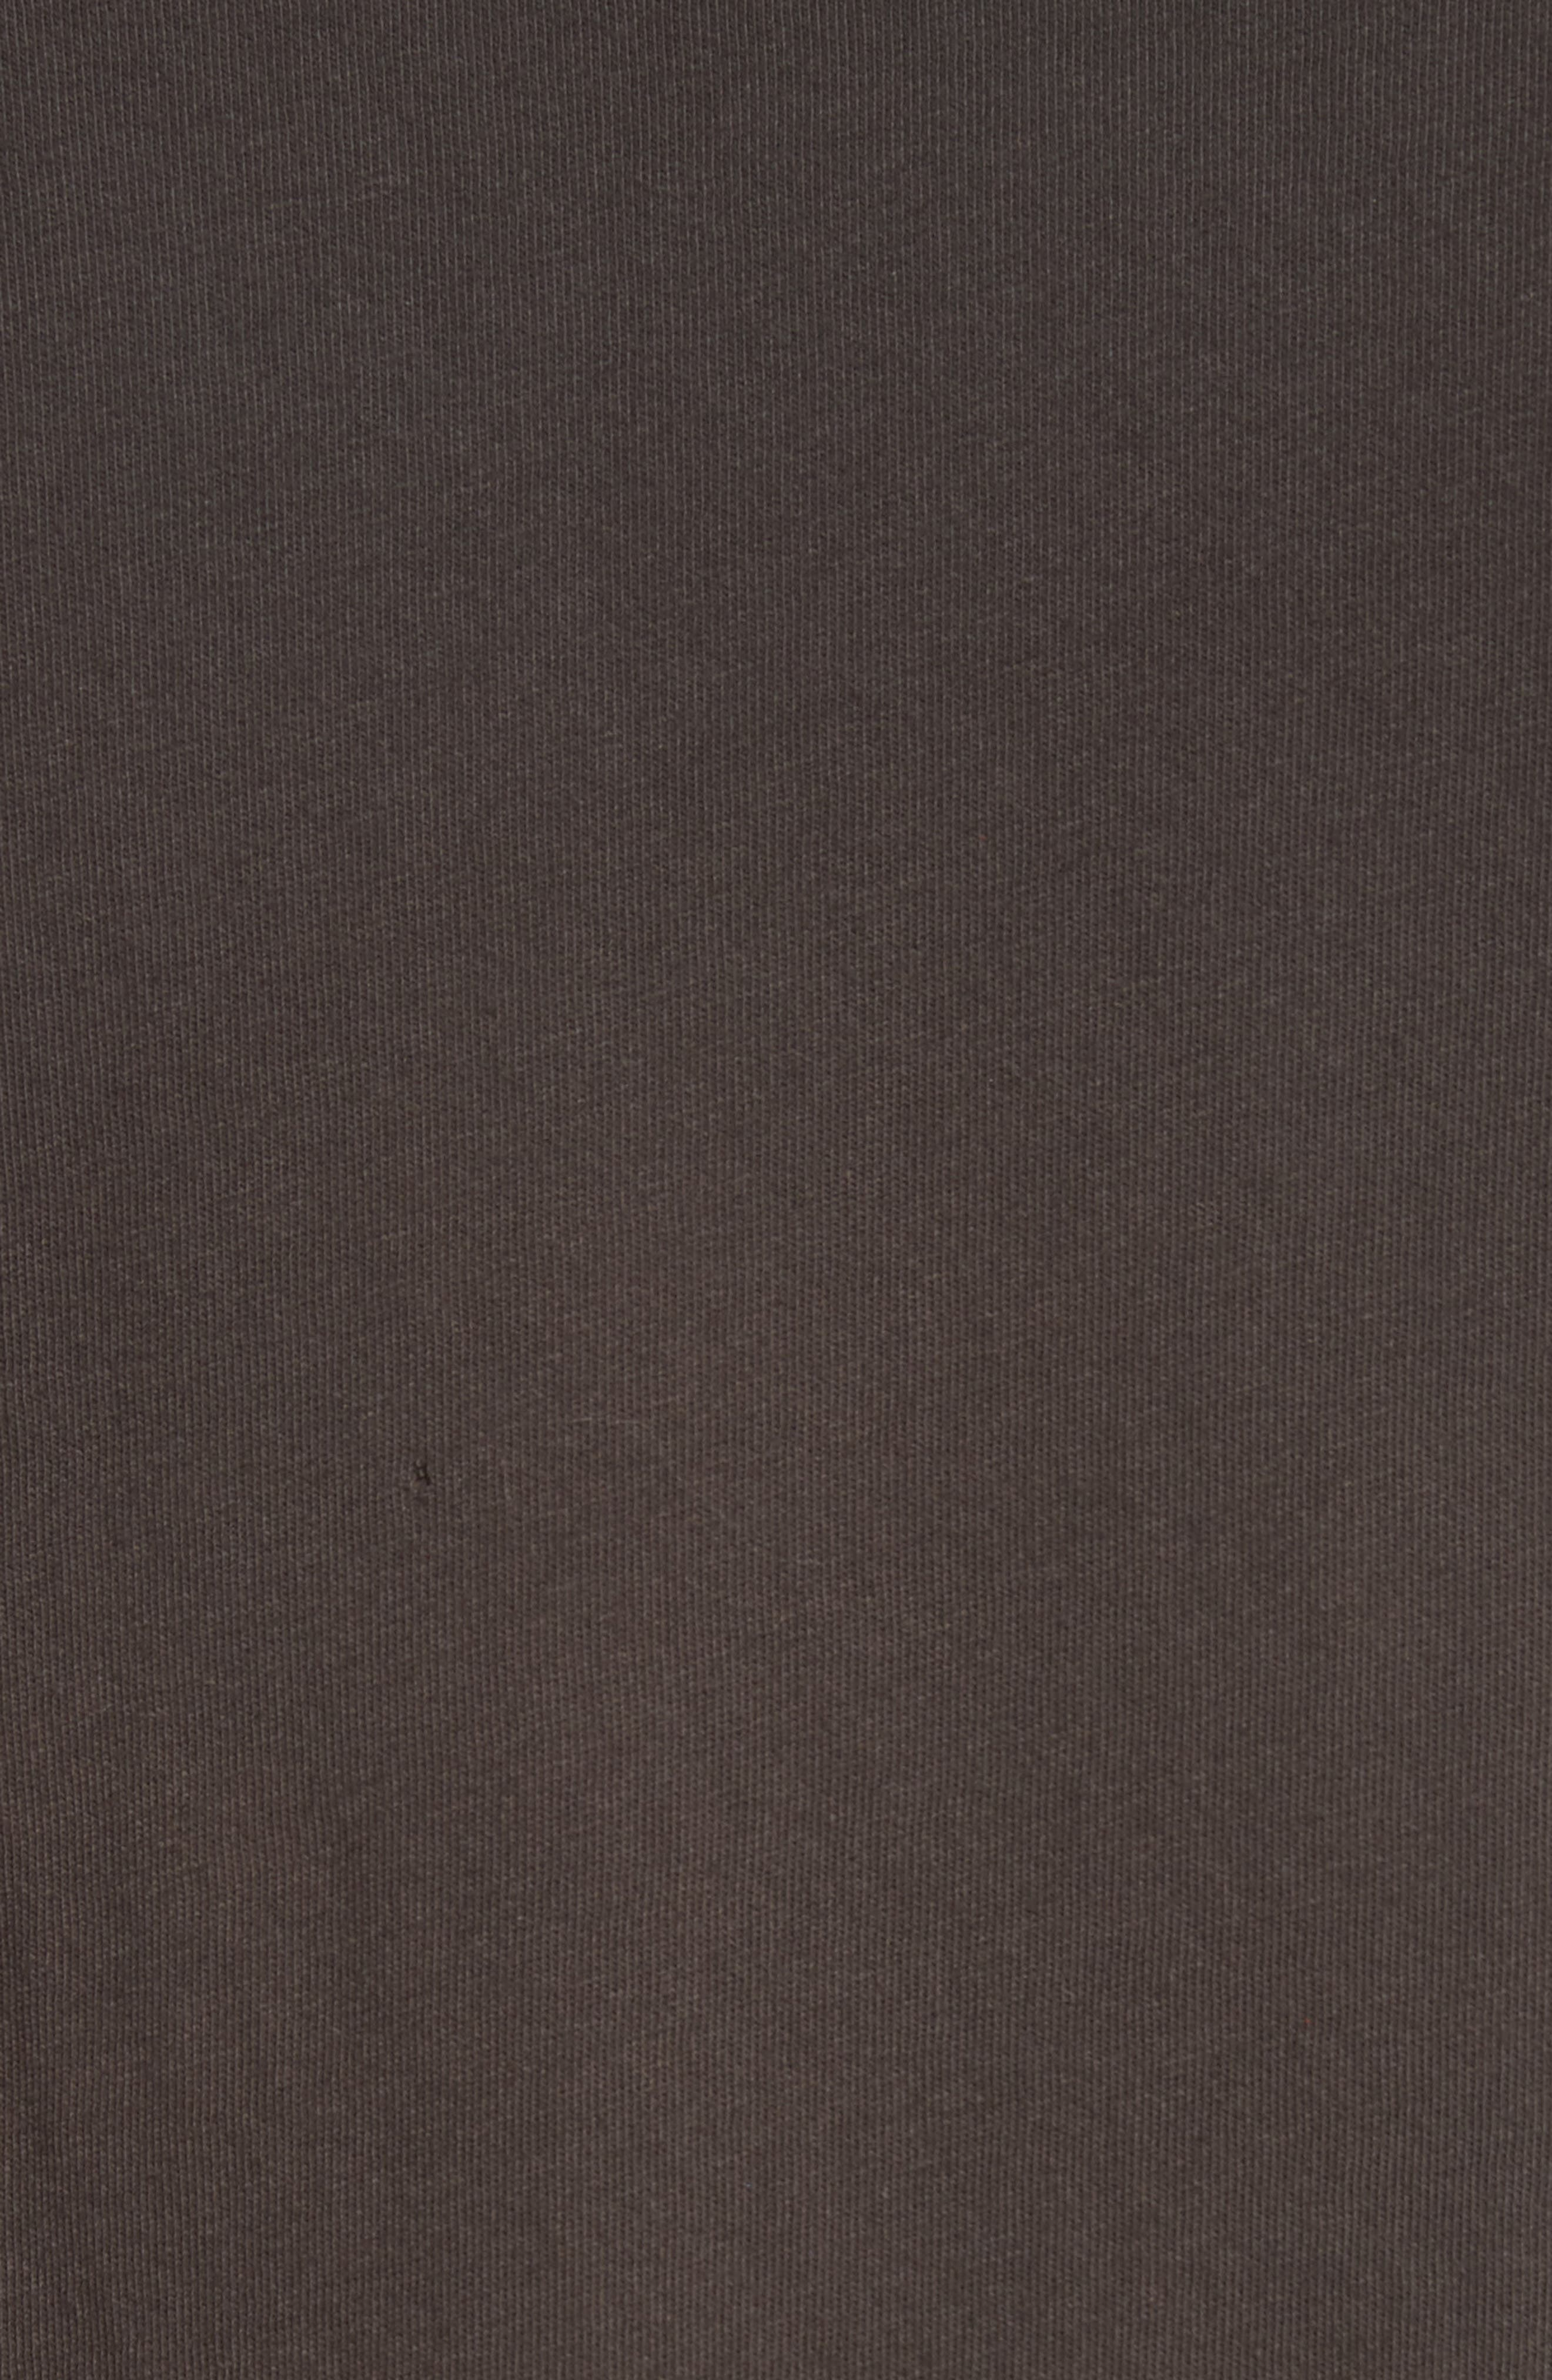 Notorious B.I.G. Graphic T-Shirt,                             Alternate thumbnail 5, color,                             001